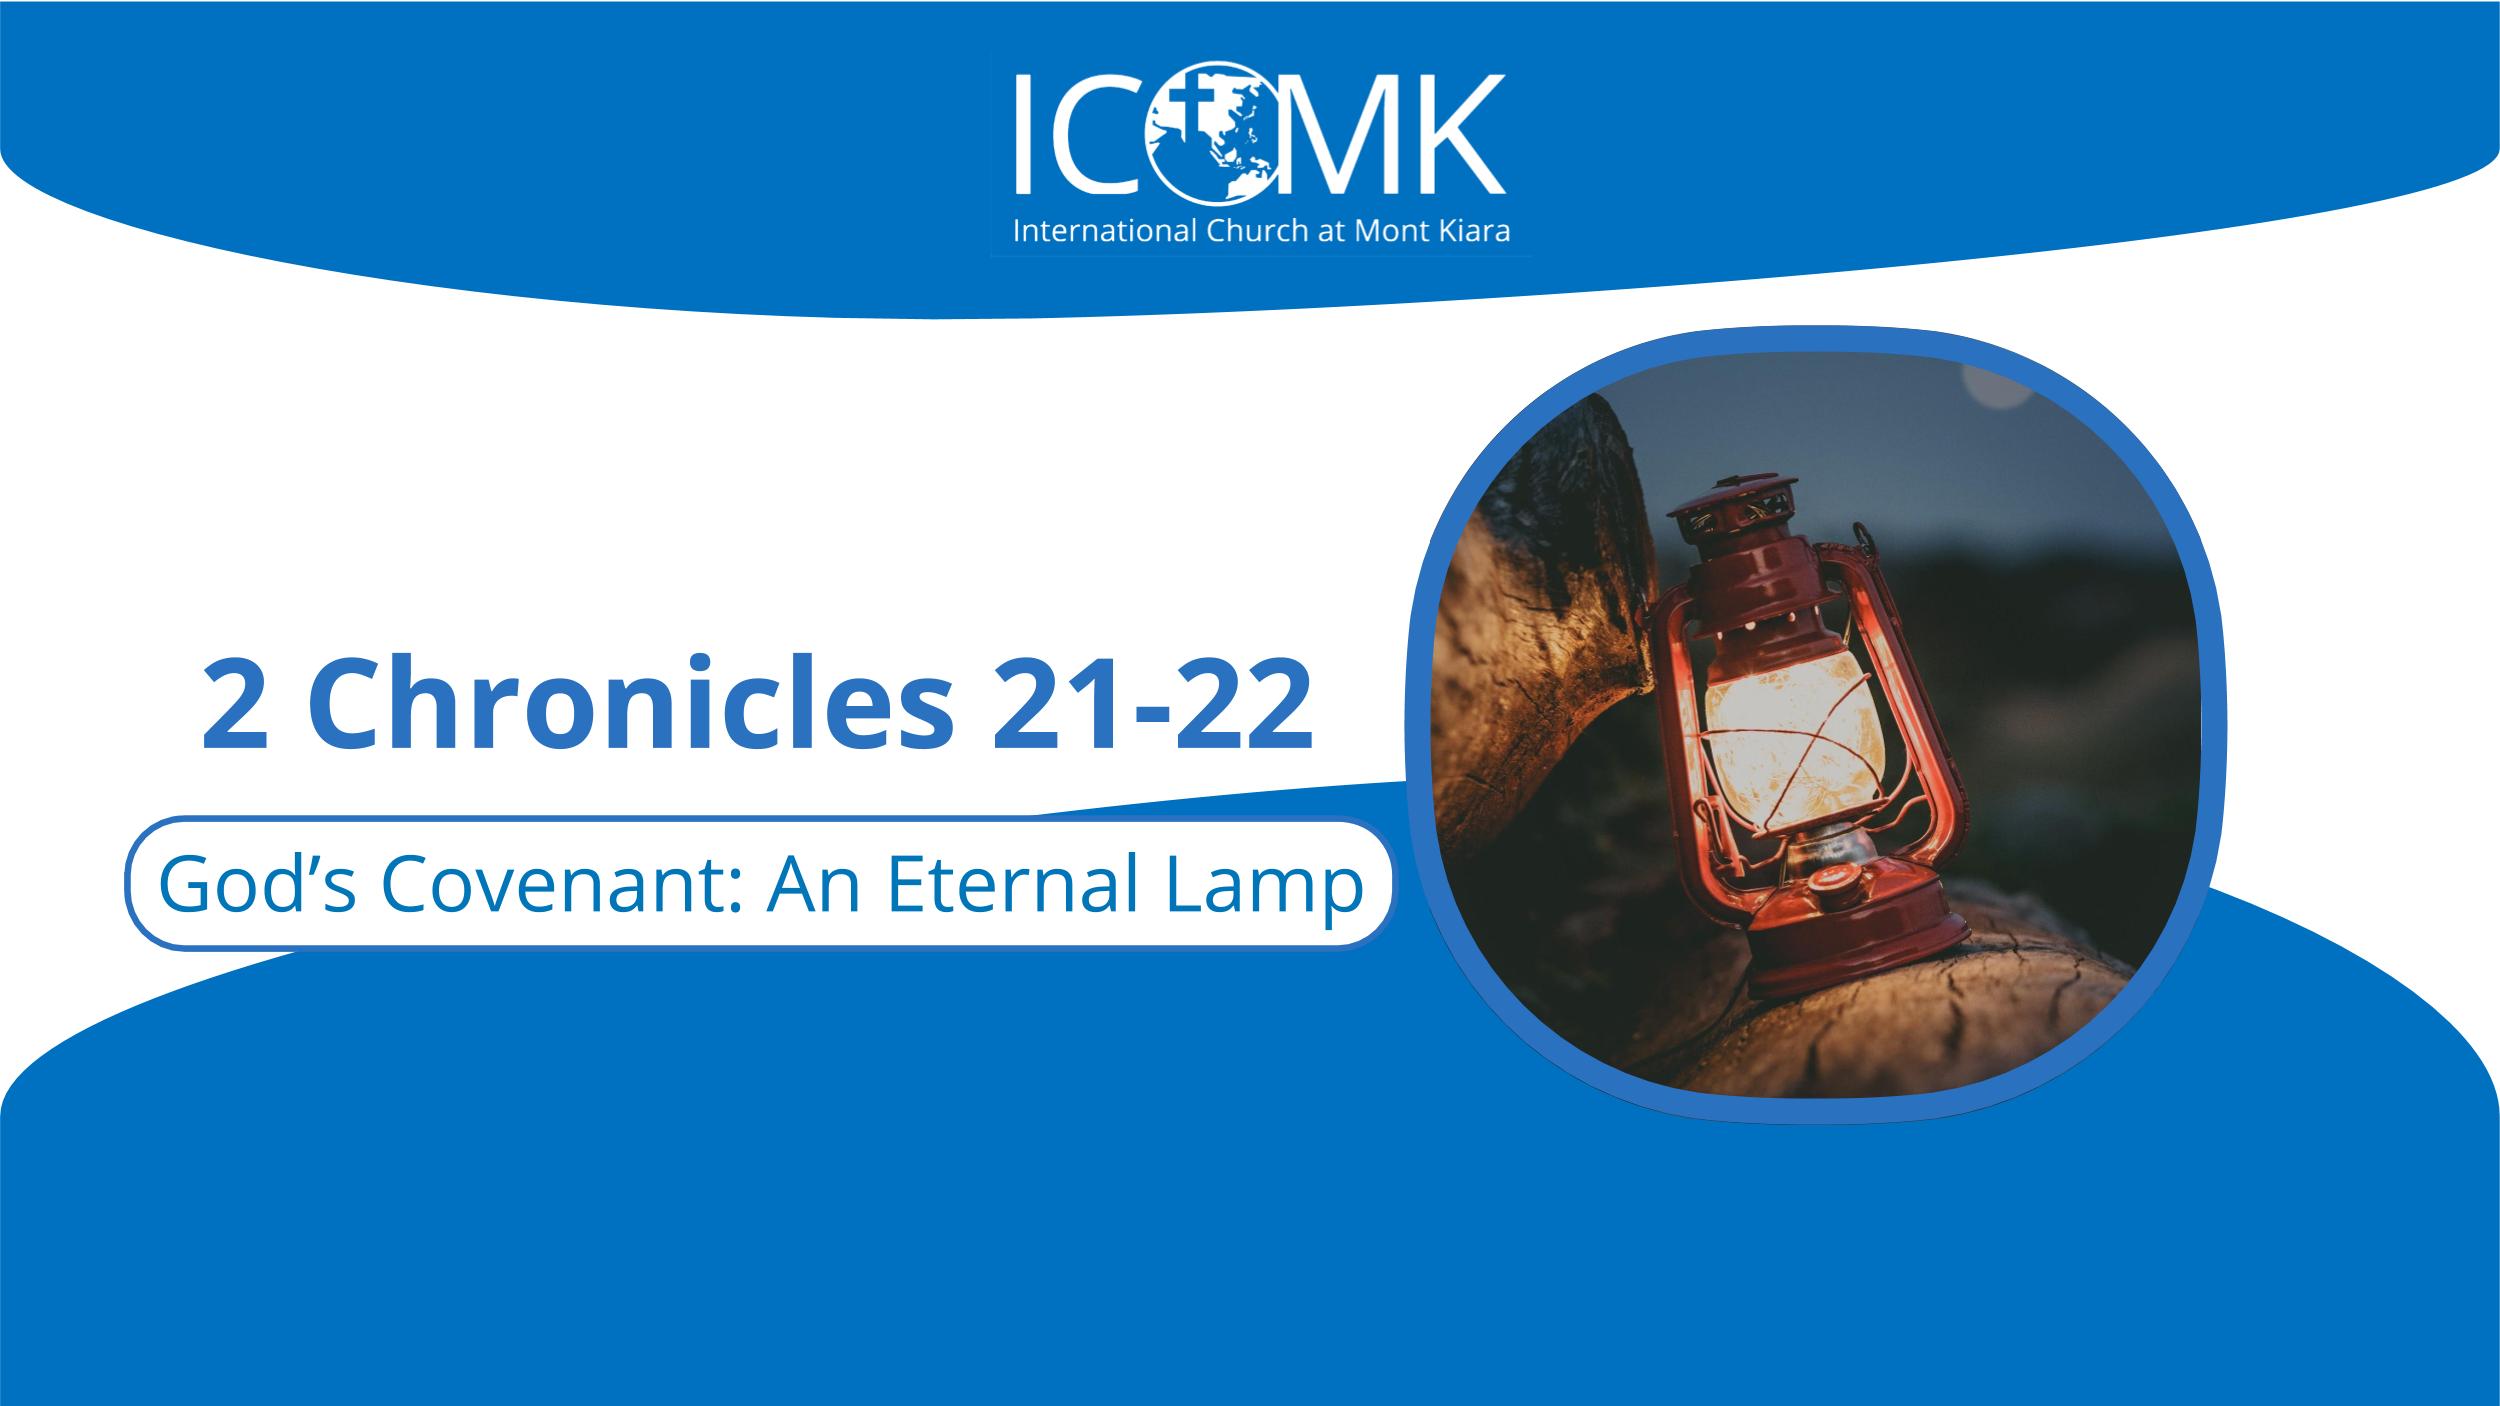 God's Covenant: An Eternal Lamp - International Church